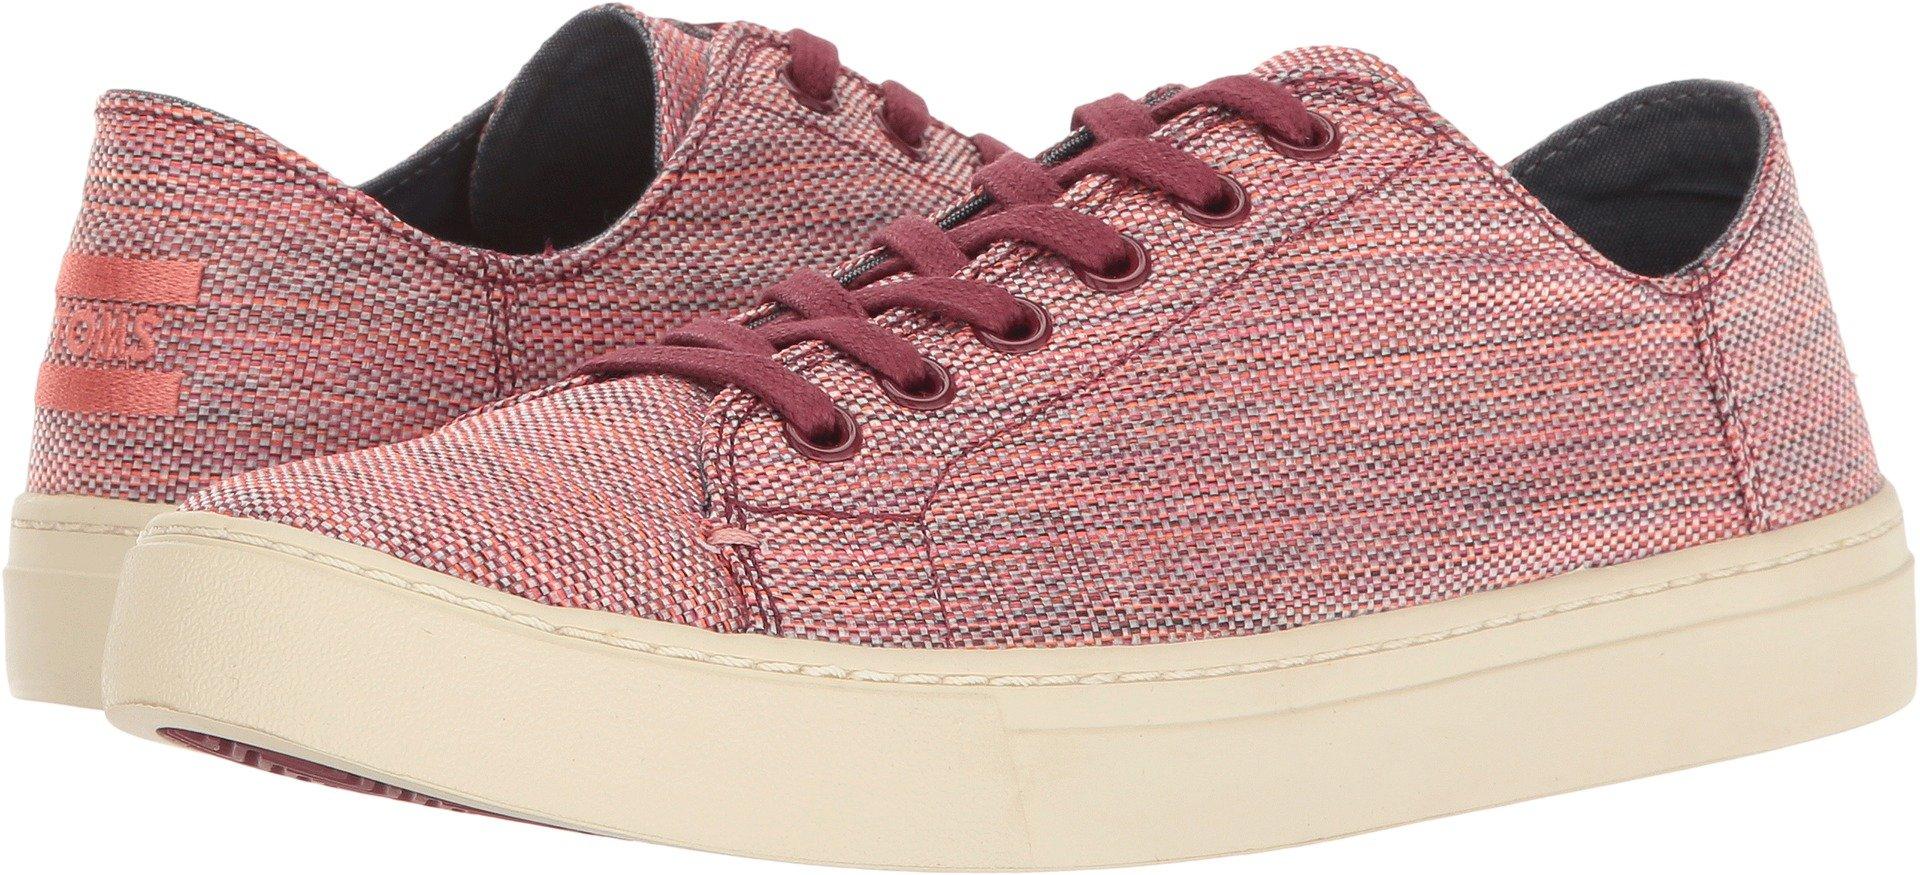 TOMS Women's Lenox Sneaker Pomegranate Woven Melange Oxford